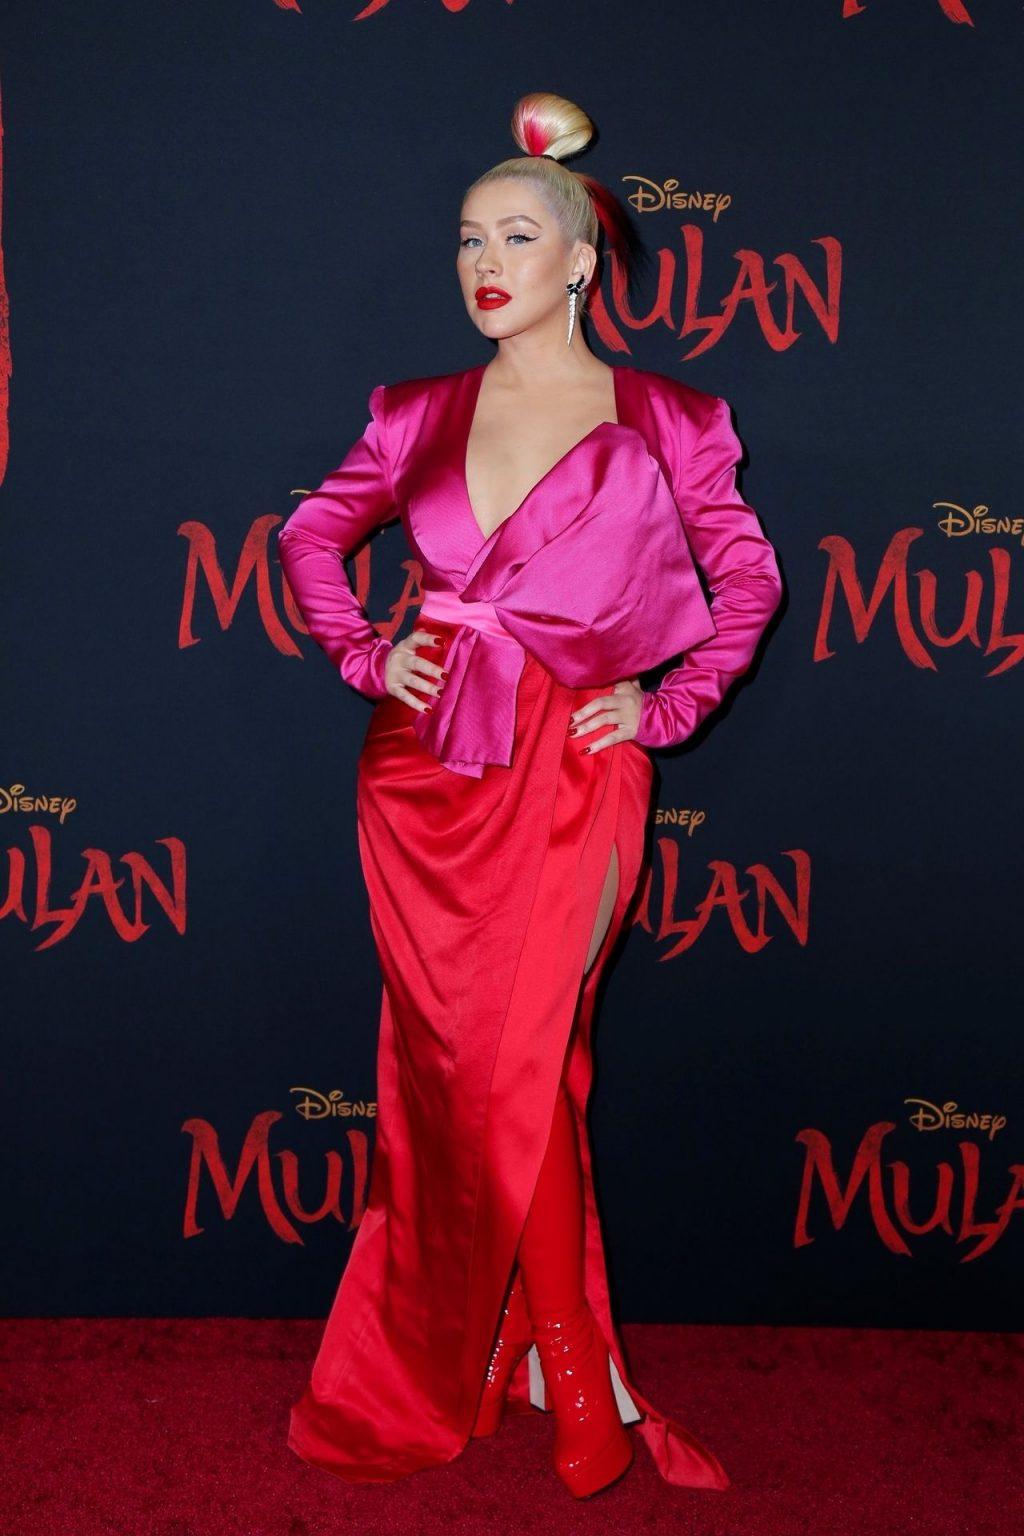 Christina Aguilera Attends the Premiere of Disney's Mulan in LA (96 Photos)